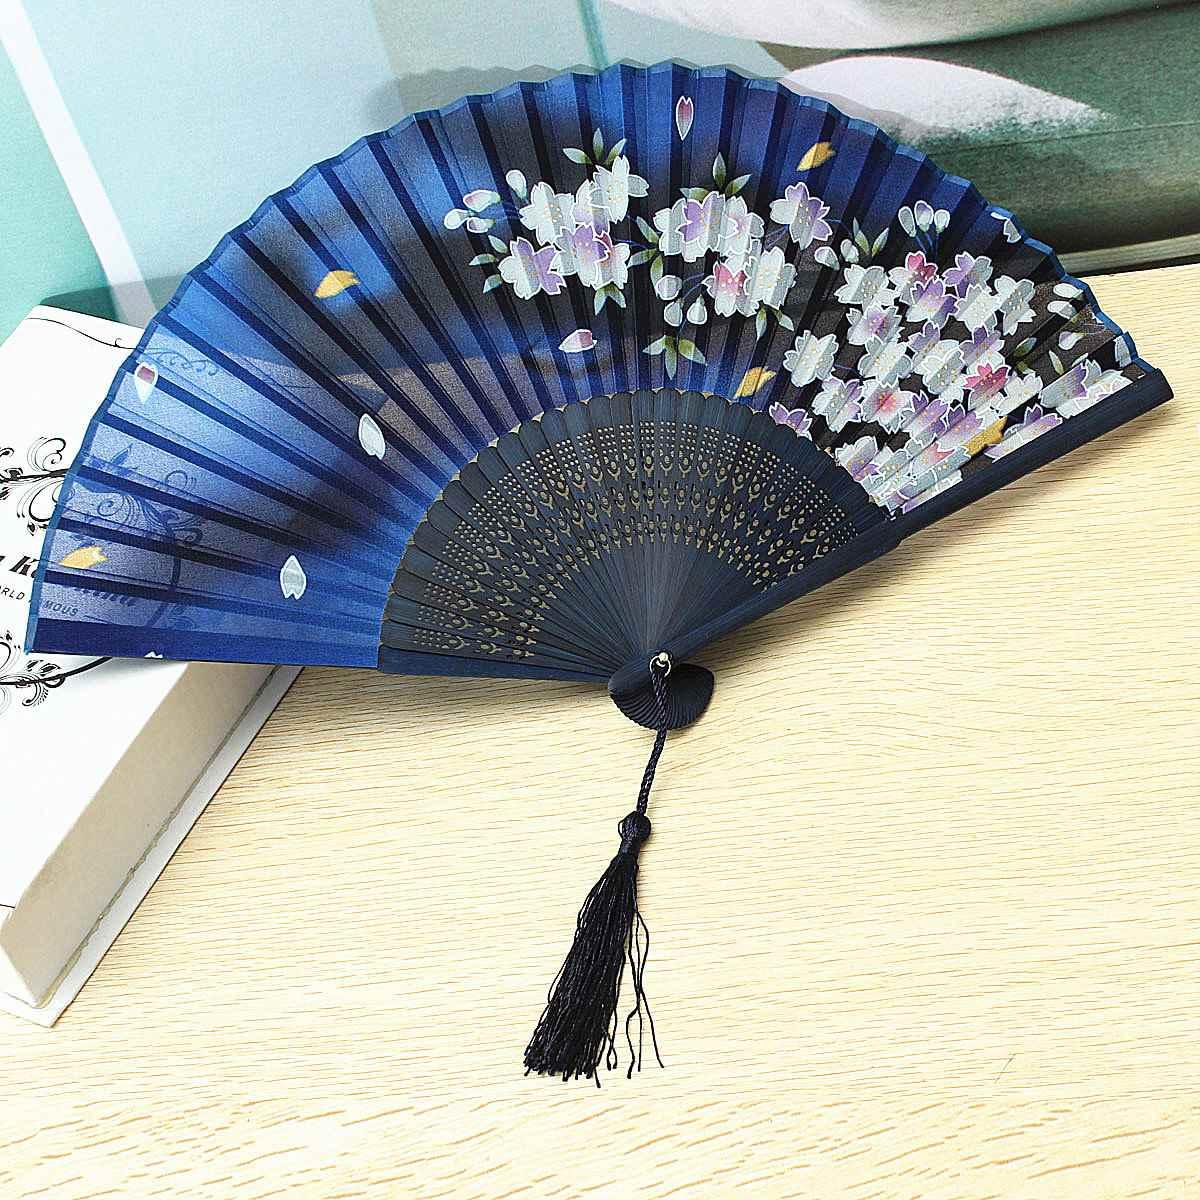 Wedding Fan Bamboo Silk Folding Held Bridal Party Dancing Fans Flower Dark Blue Elegant Hand Fans Supplies(China (Mainland))